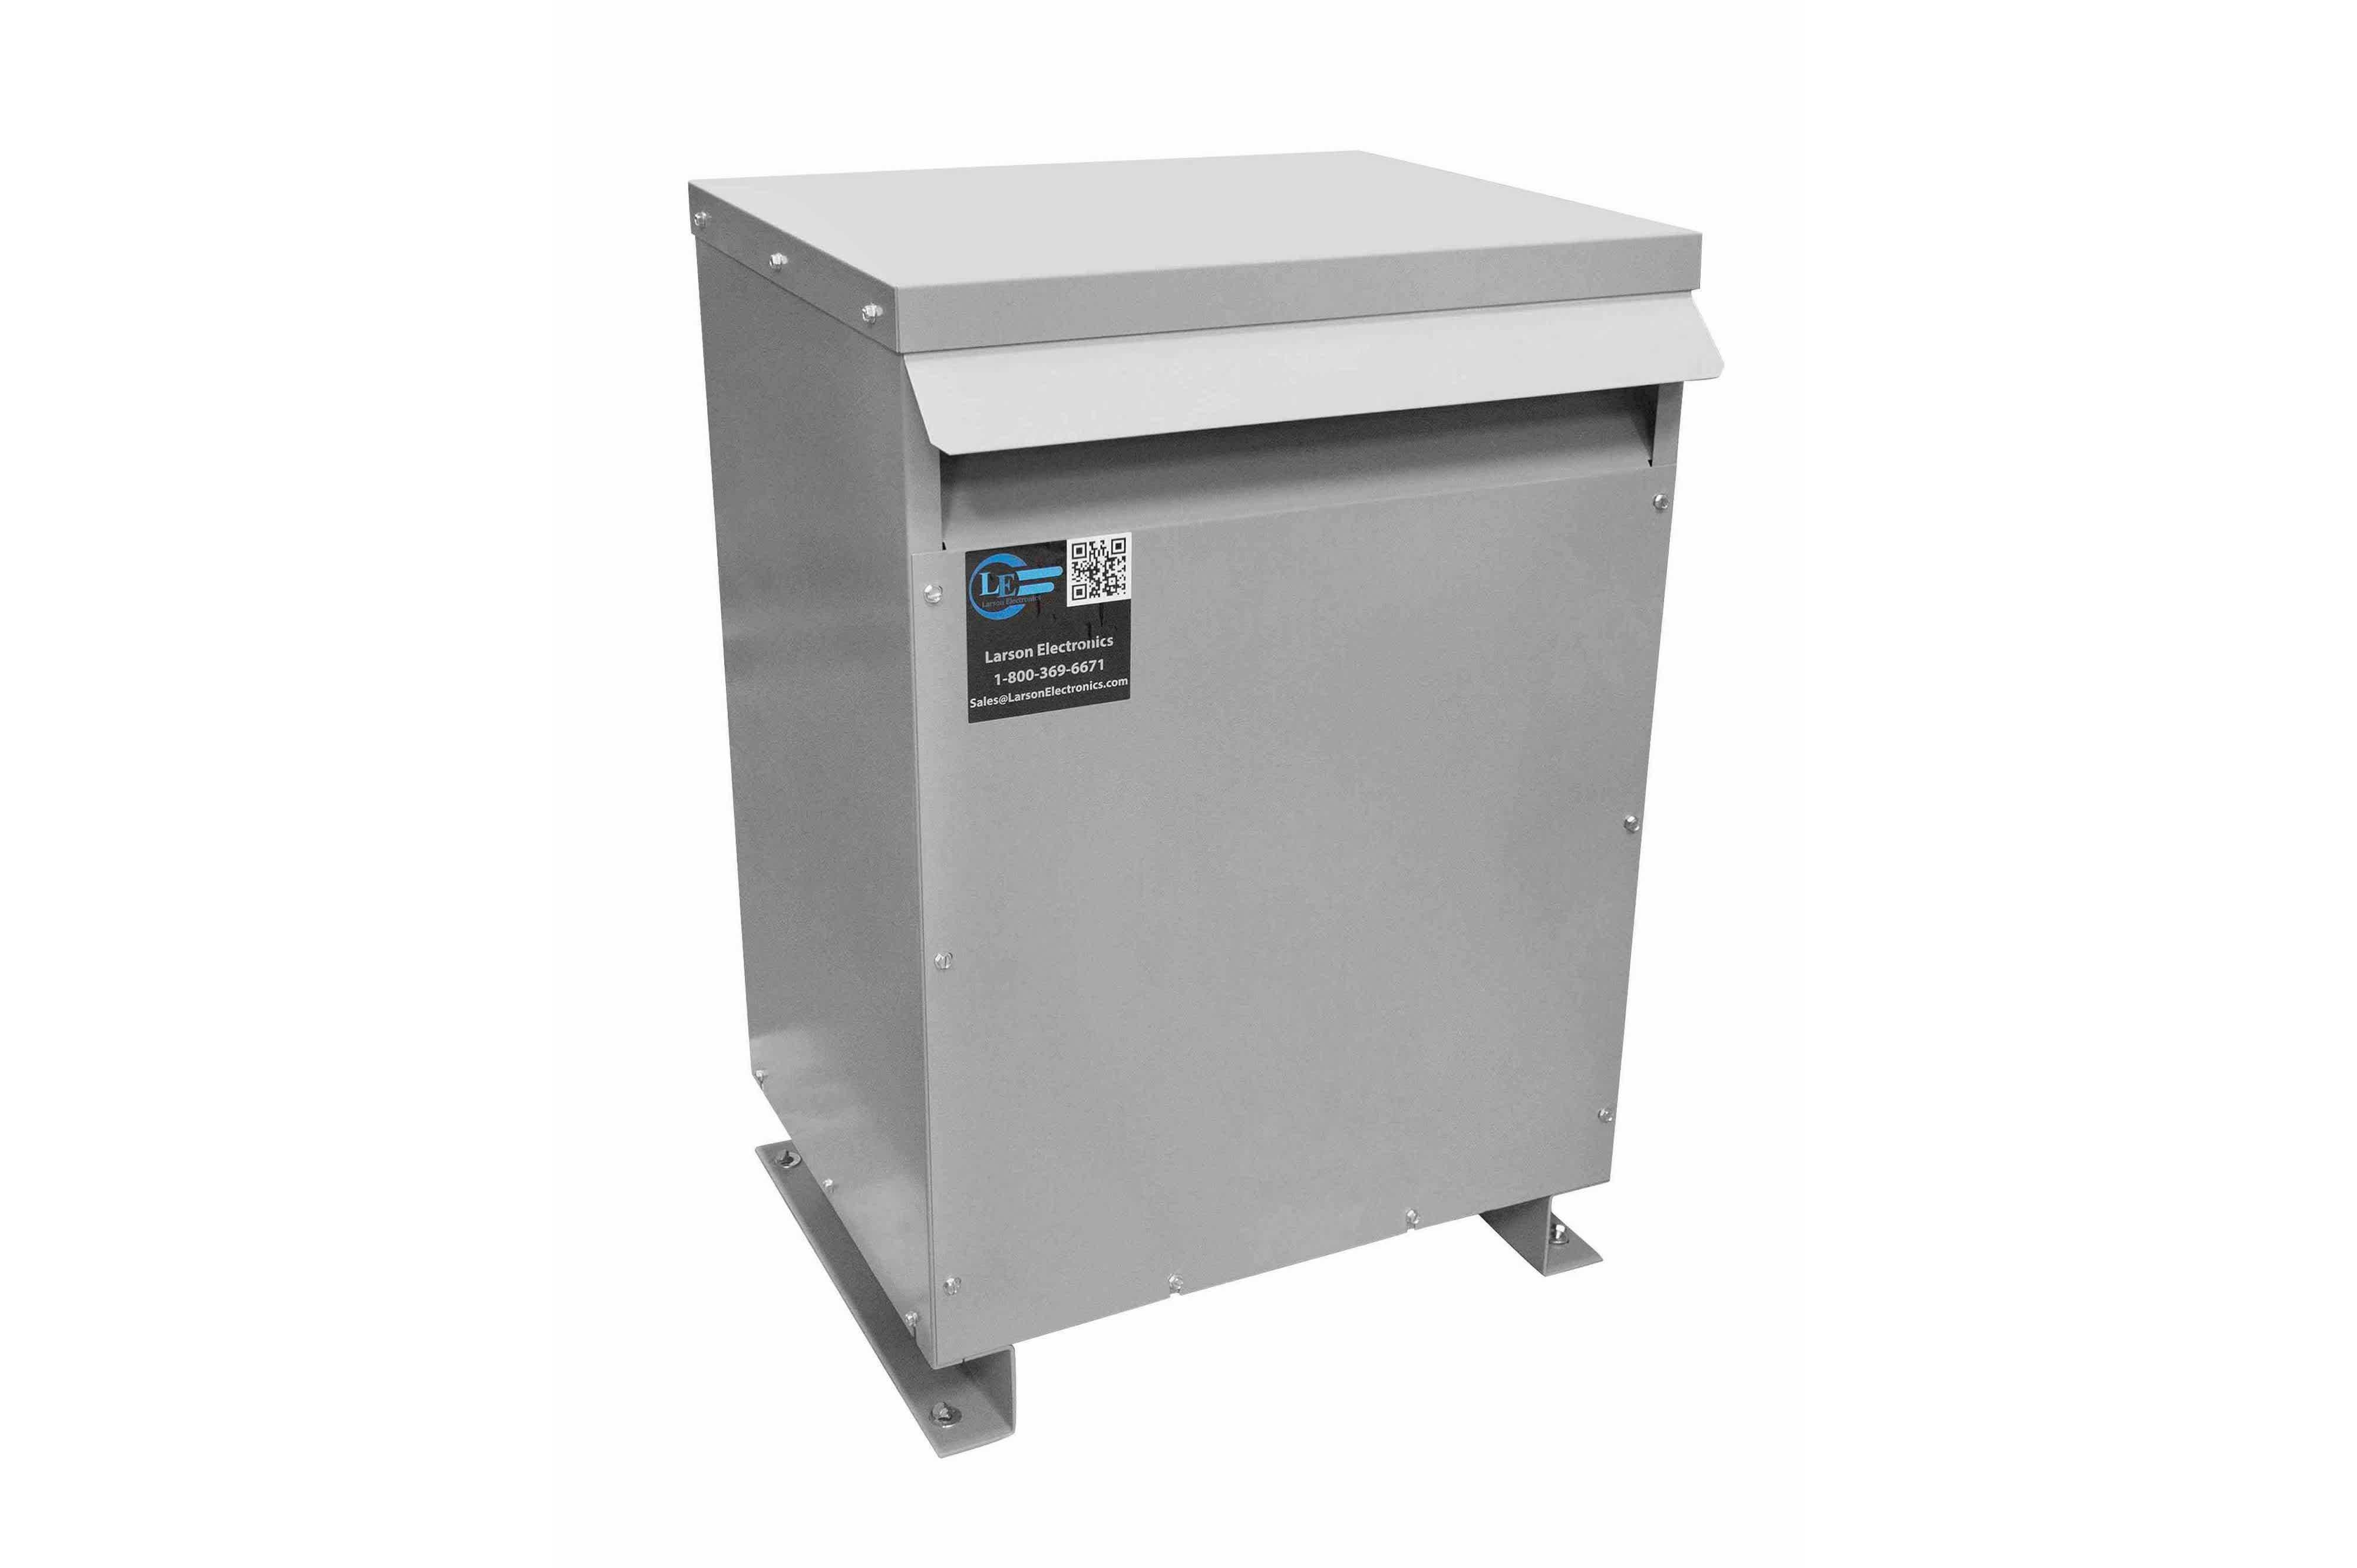 40 kVA 3PH Isolation Transformer, 600V Wye Primary, 480Y/277 Wye-N Secondary, N3R, Ventilated, 60 Hz